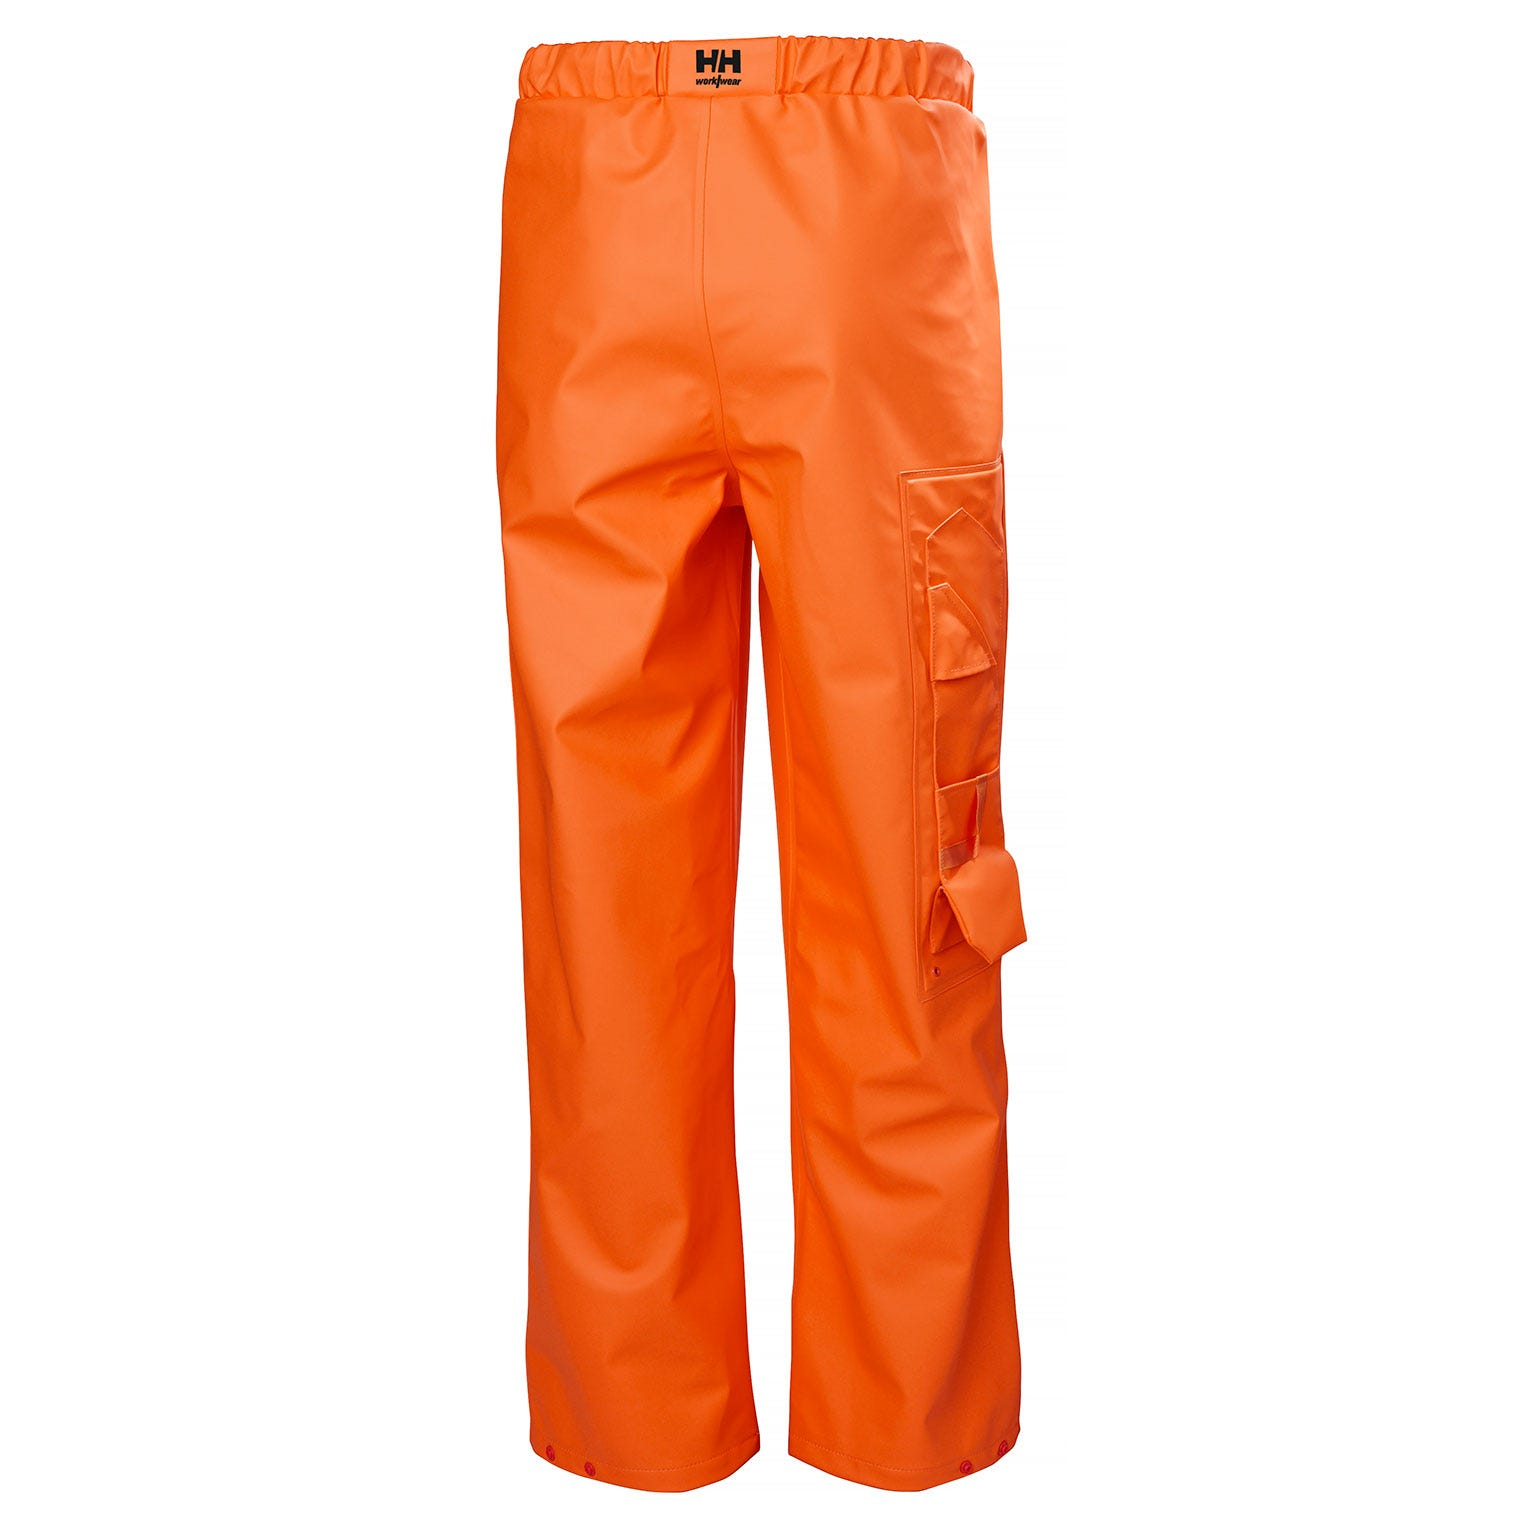 Helly Hansen Broeken Gale 70484 Bouwbroek donker oranje(290)